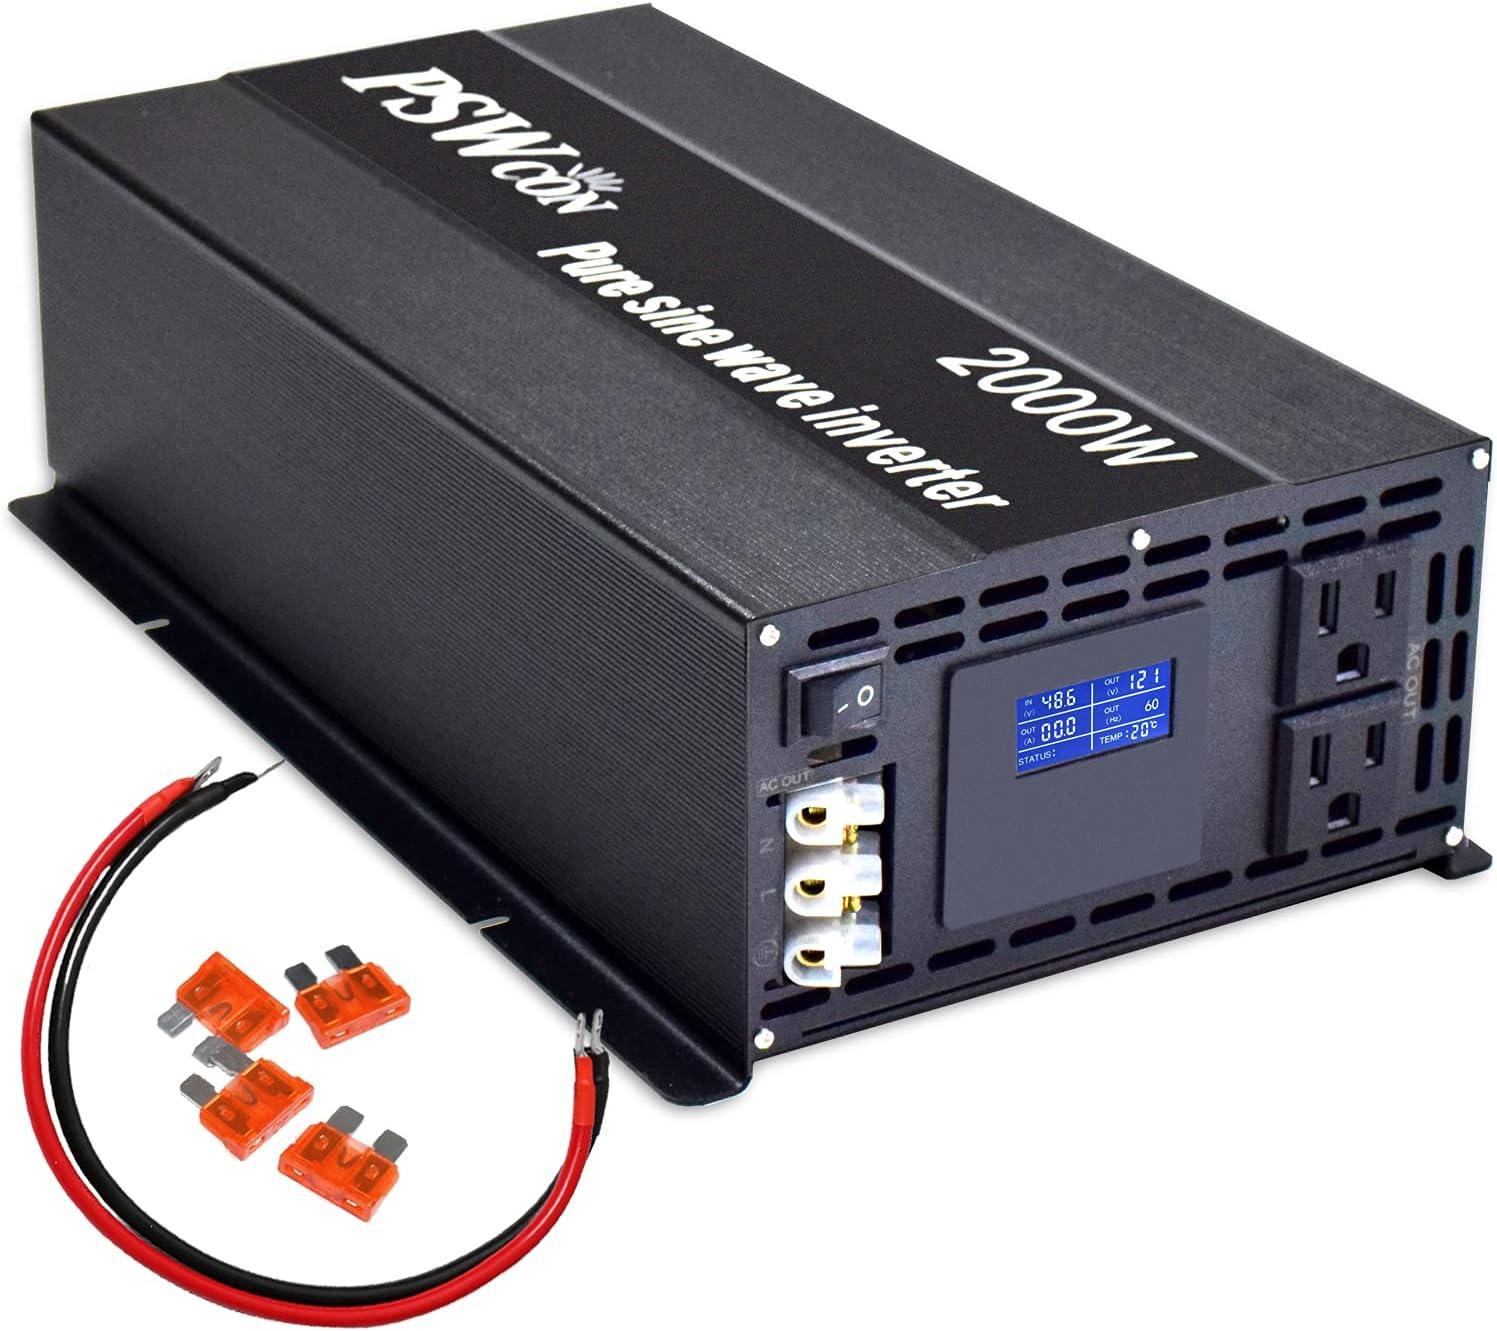 PSWCON Power Inverter Pure Sine Wave Inverter 2000 Watt 48V dc to ac 110V 120V Converter Peak 4000W Off Grid Solar System for Home Use, RV